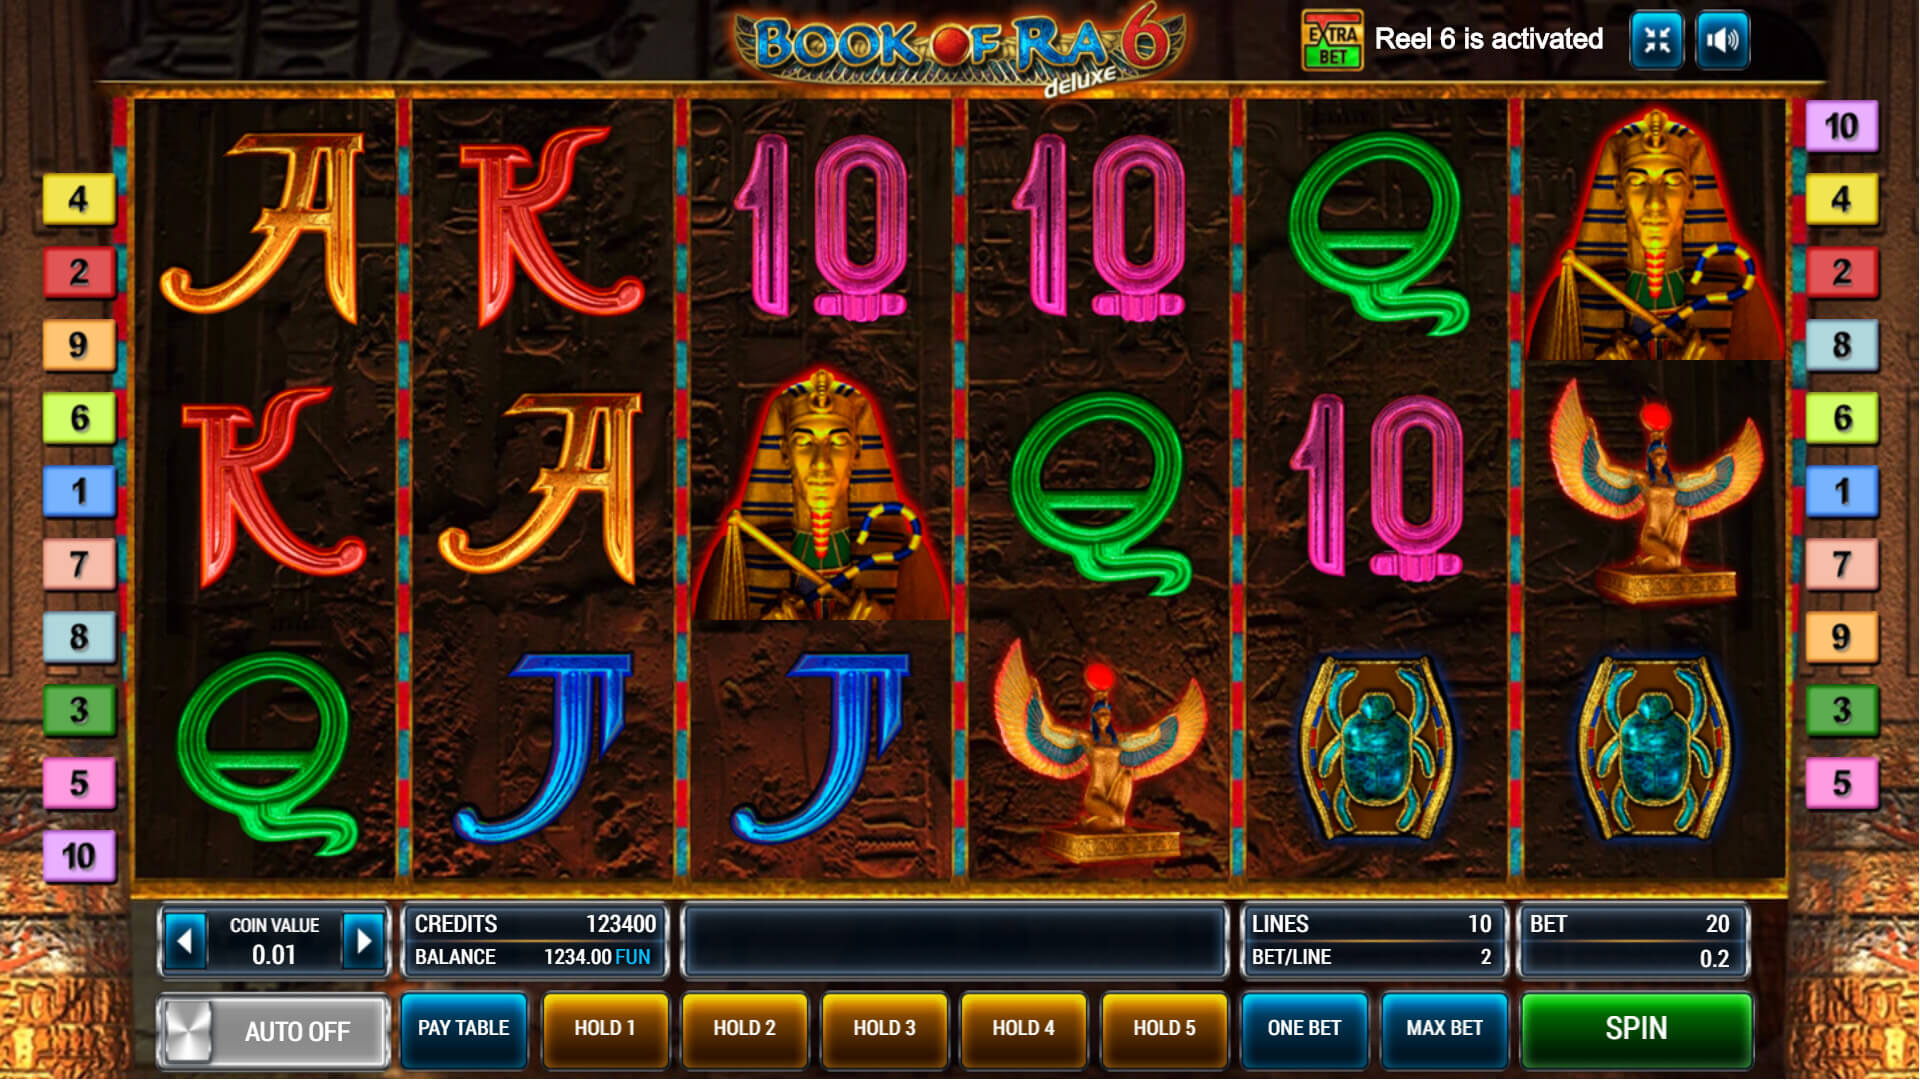 Vanilla prepaid mastercard online gambling